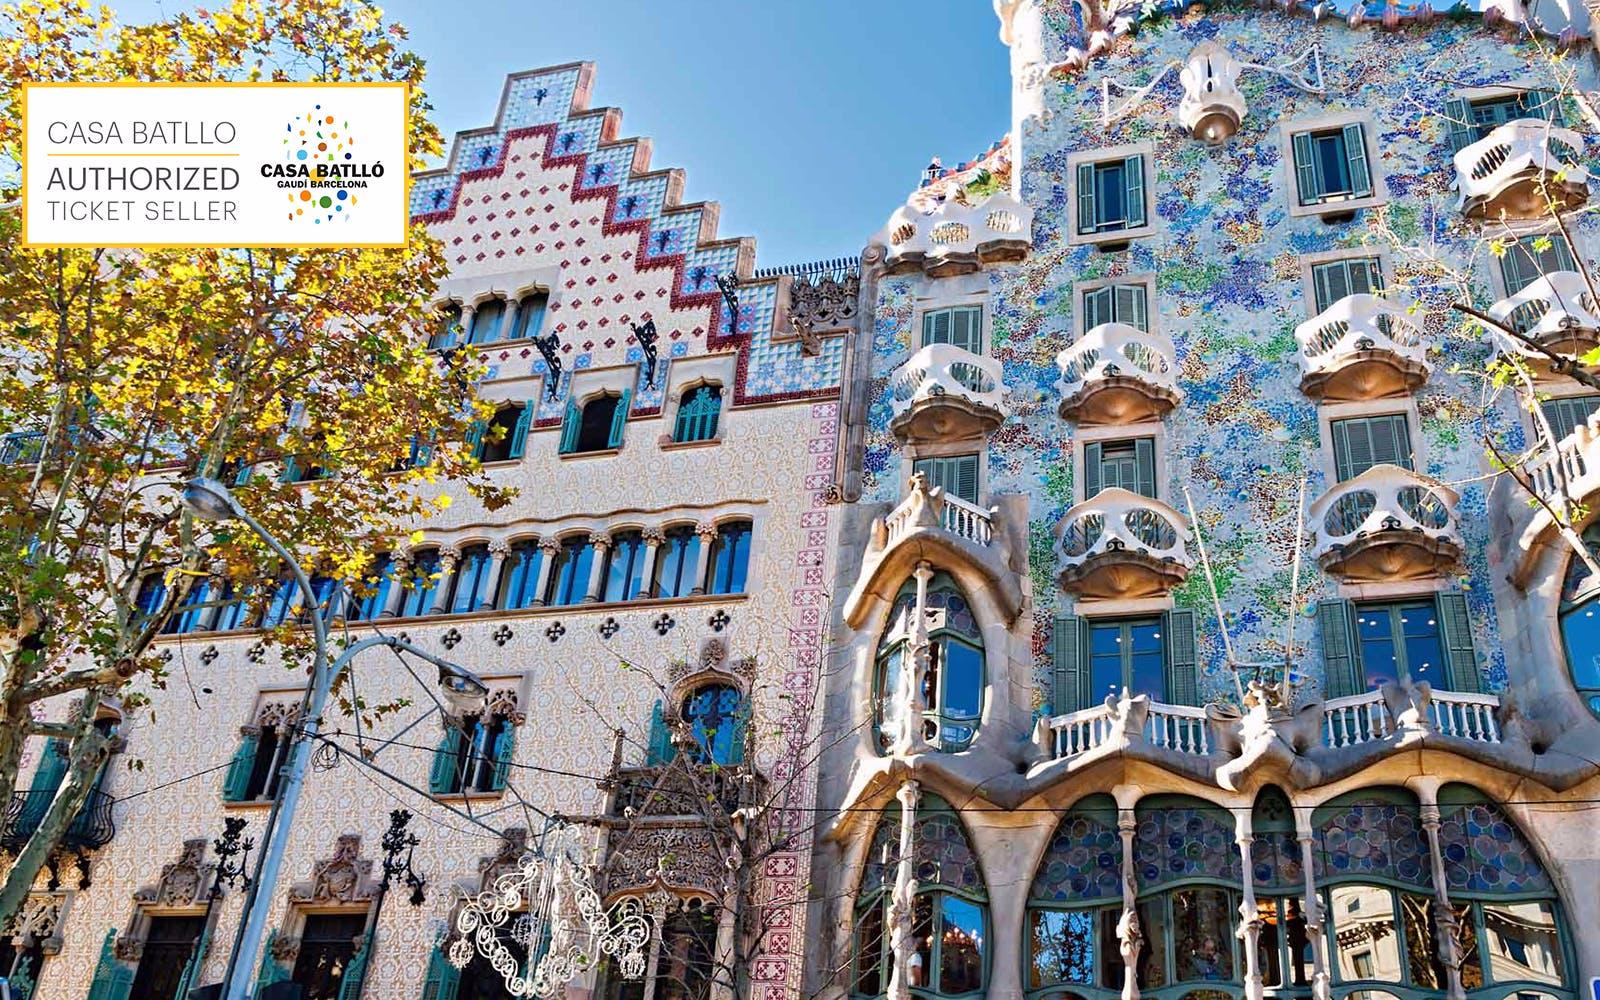 gaudi barcelona buildings - casa batllo